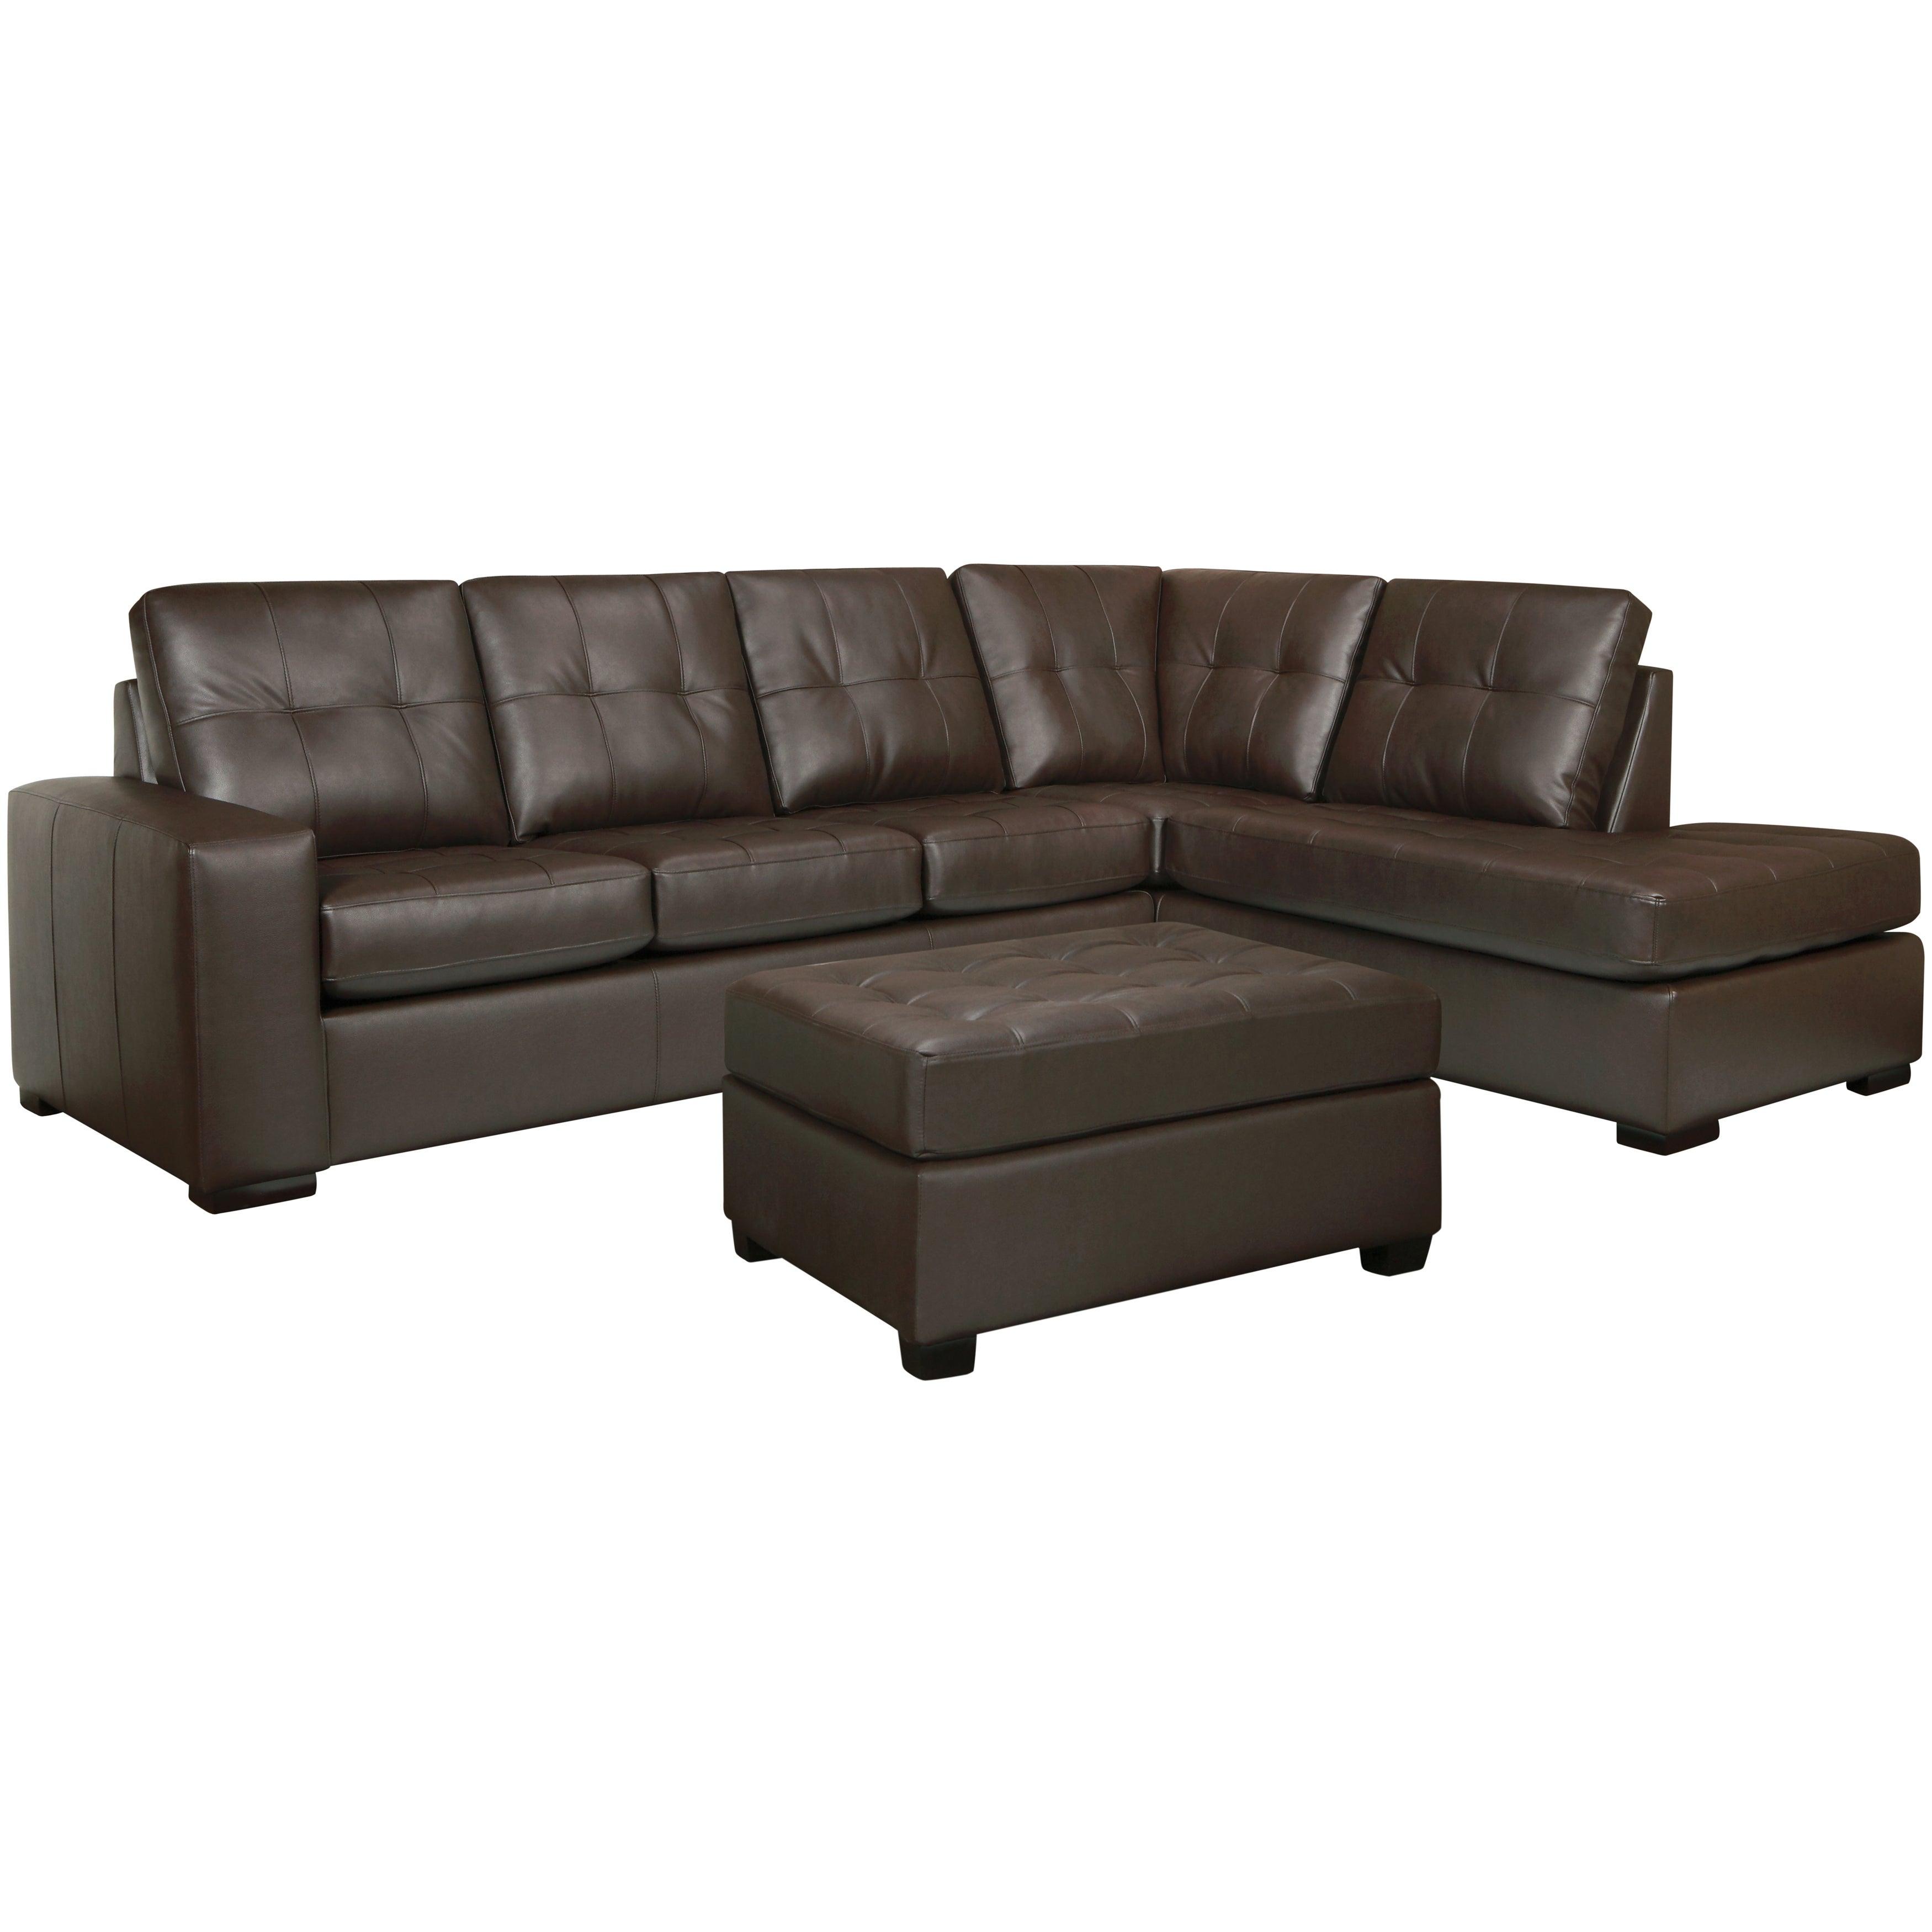 Drake Chocolate Brown Italian Leather Sectional Sofa And Ottoman  ~ Chocolate Sectional Sofa Set With Chaise